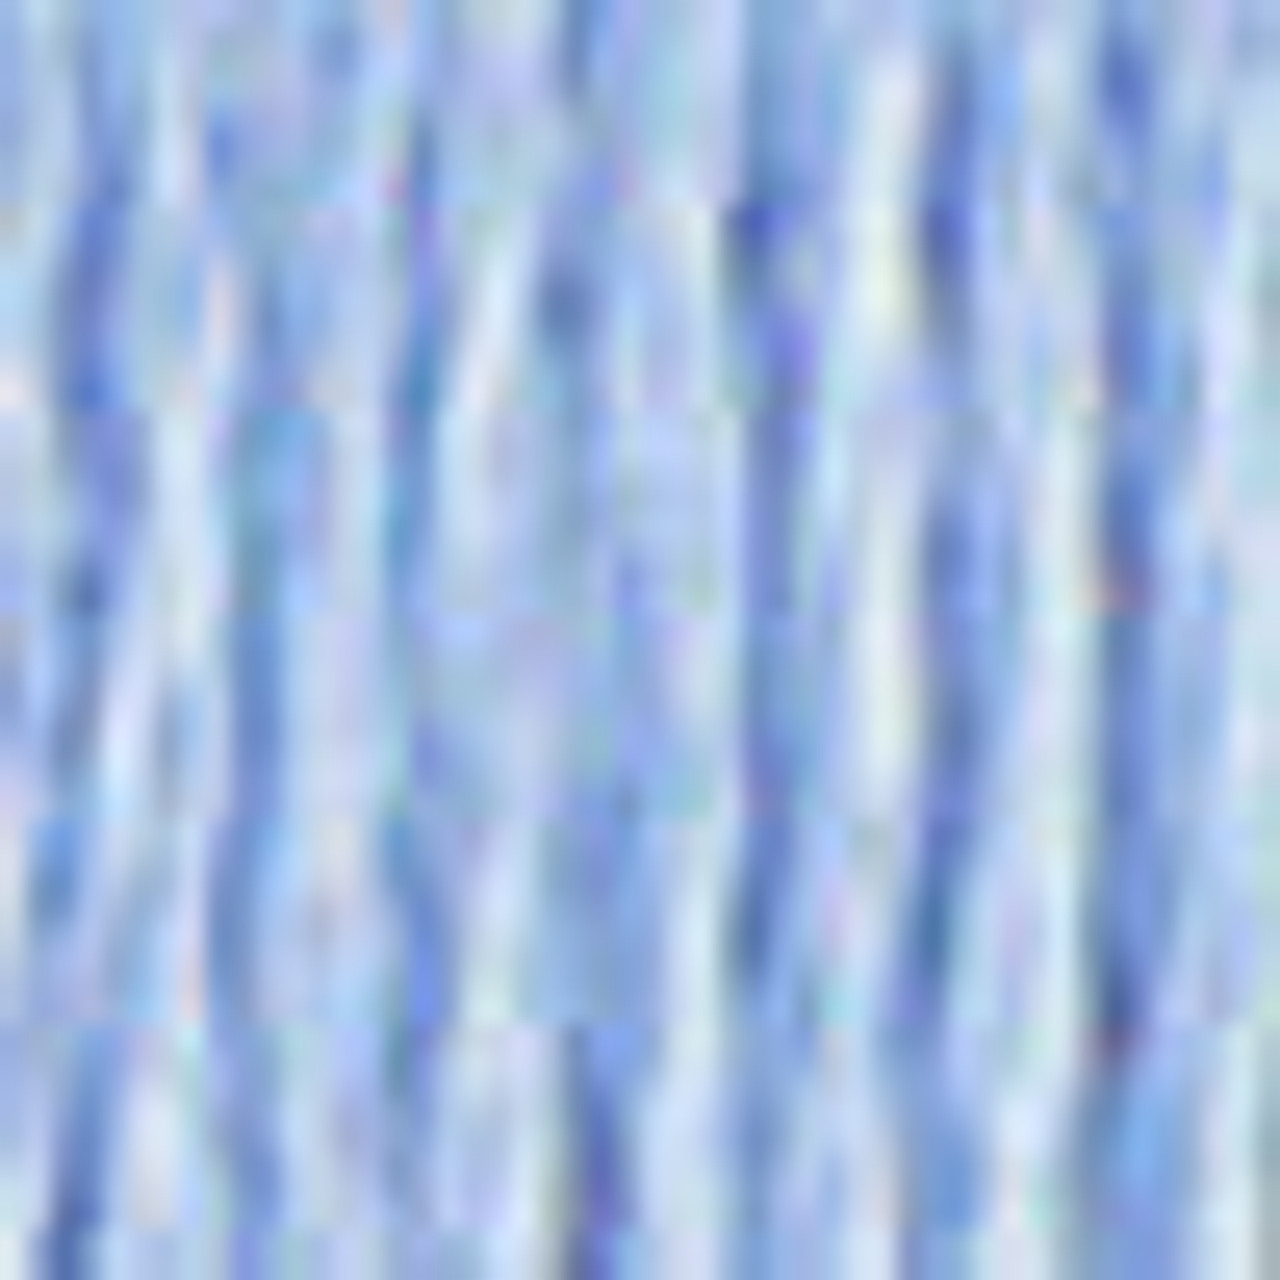 DMC # 3840 Light Lavender Blue Floss / Thread